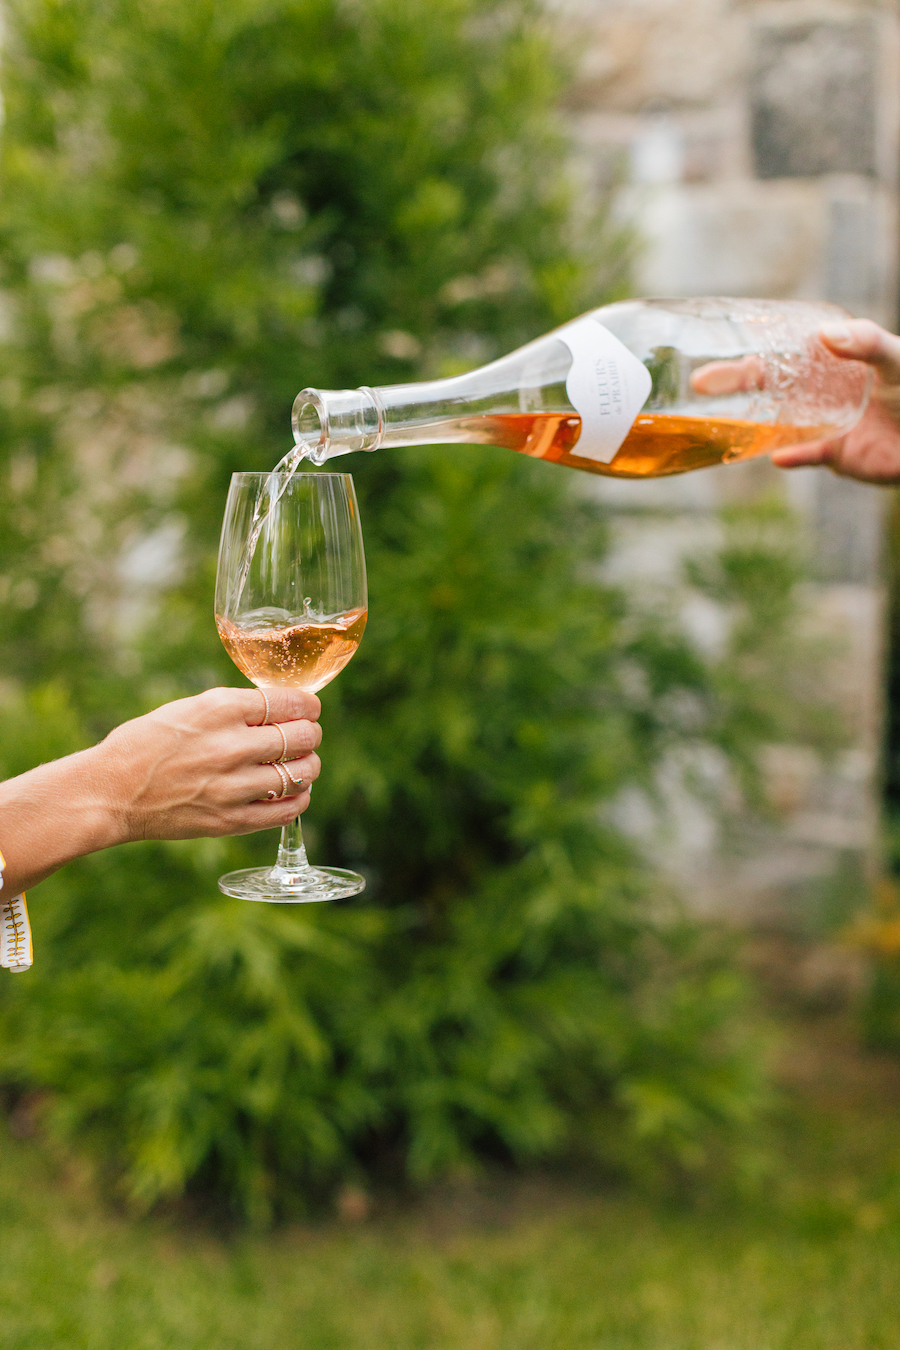 rose-wine-pour.jpg